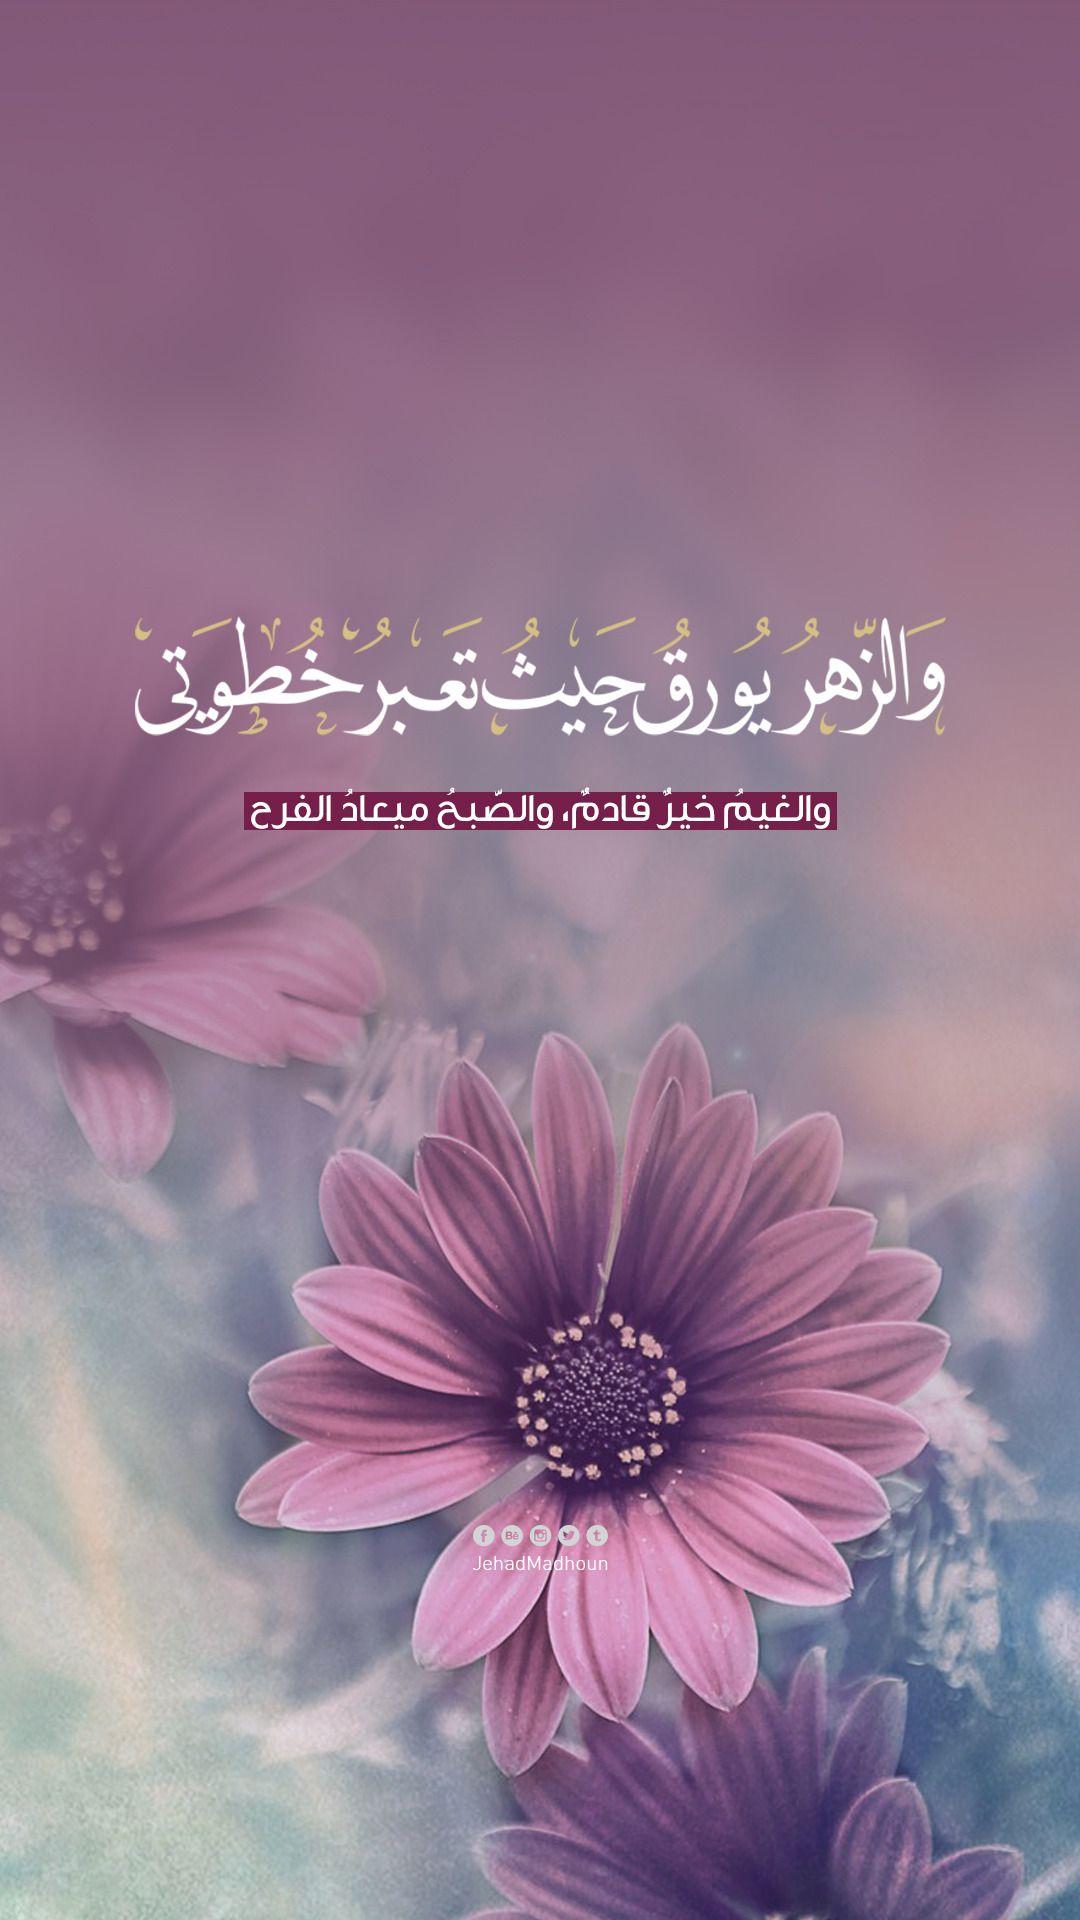 Jehadmadhoun تصاميم خلفيات موبايل Romantic Love Quotes Photo Quotes Islamic Quotes Quran